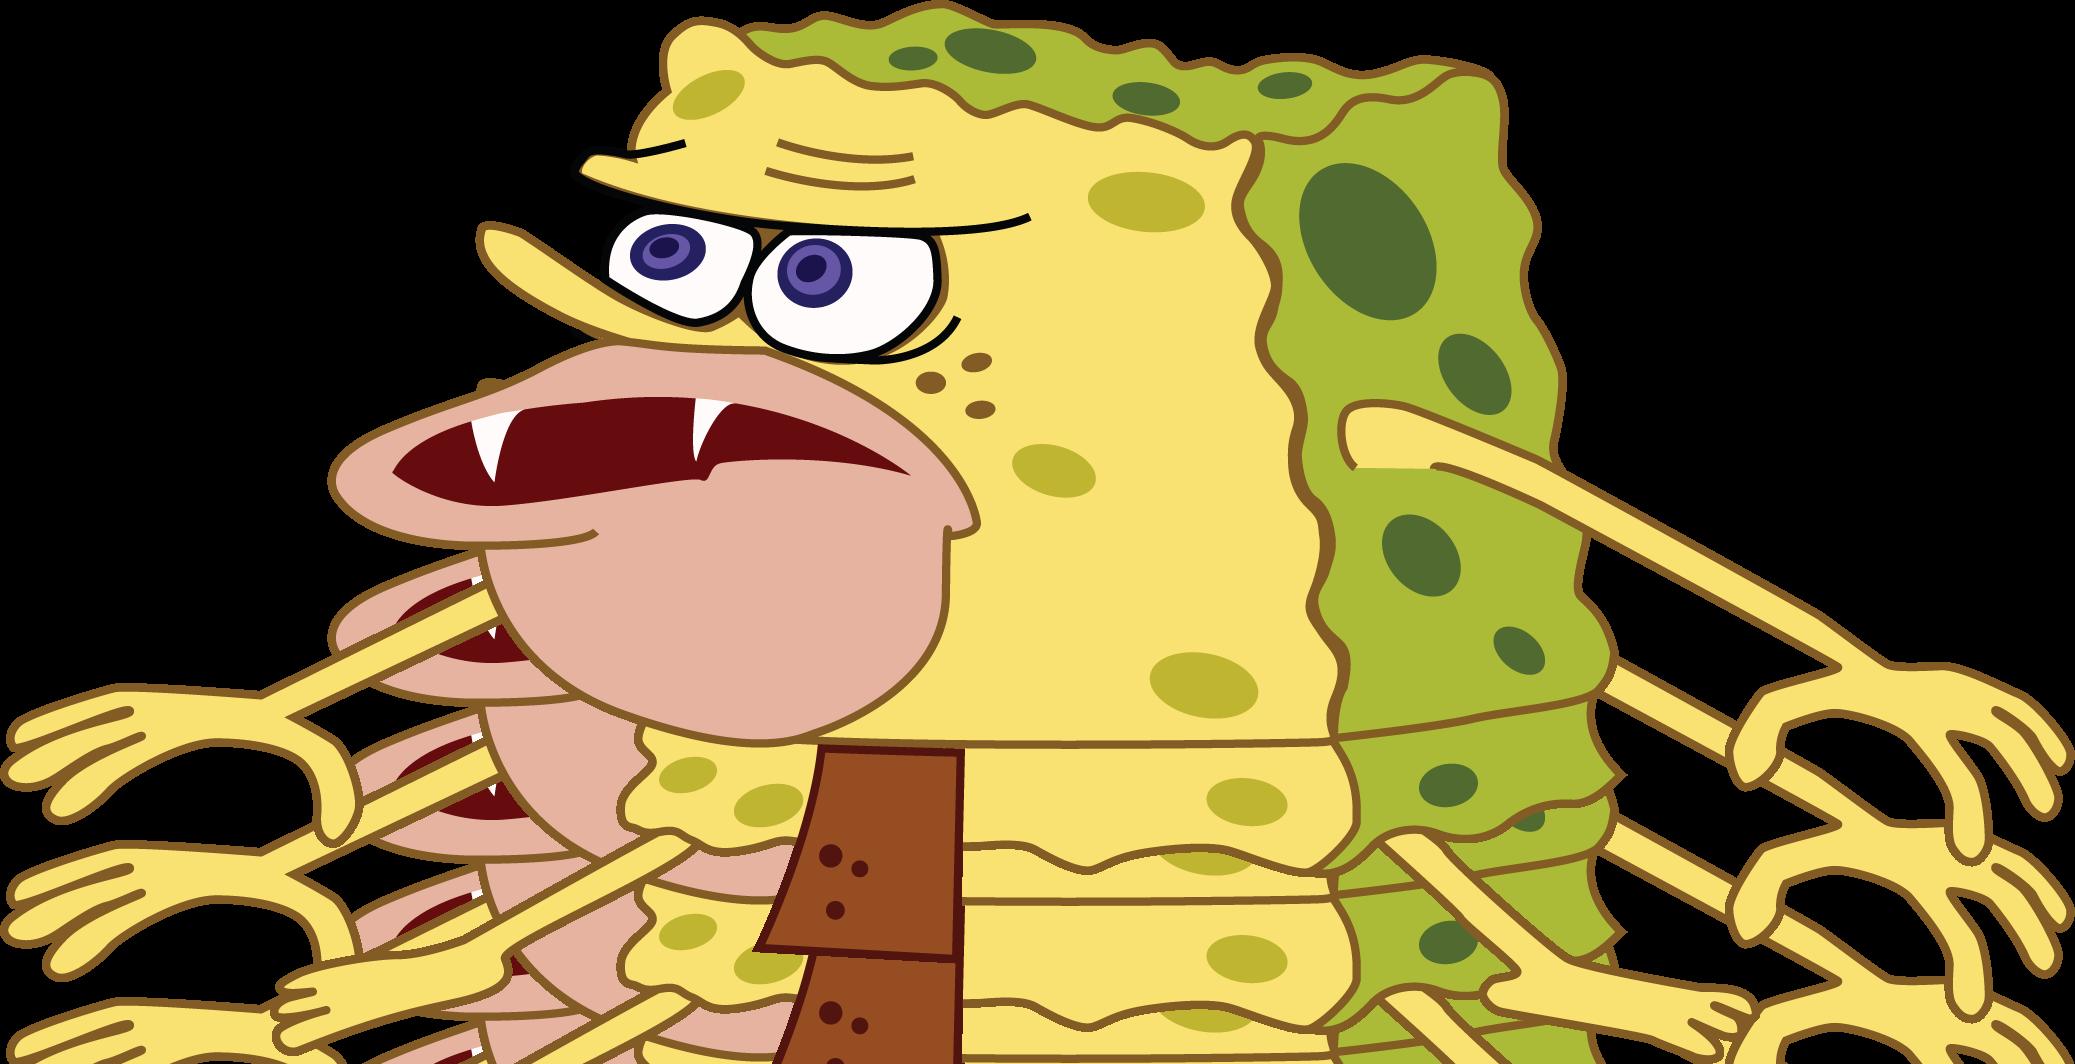 High res template | SpongeGar / Primitive Sponge / Caveman ...